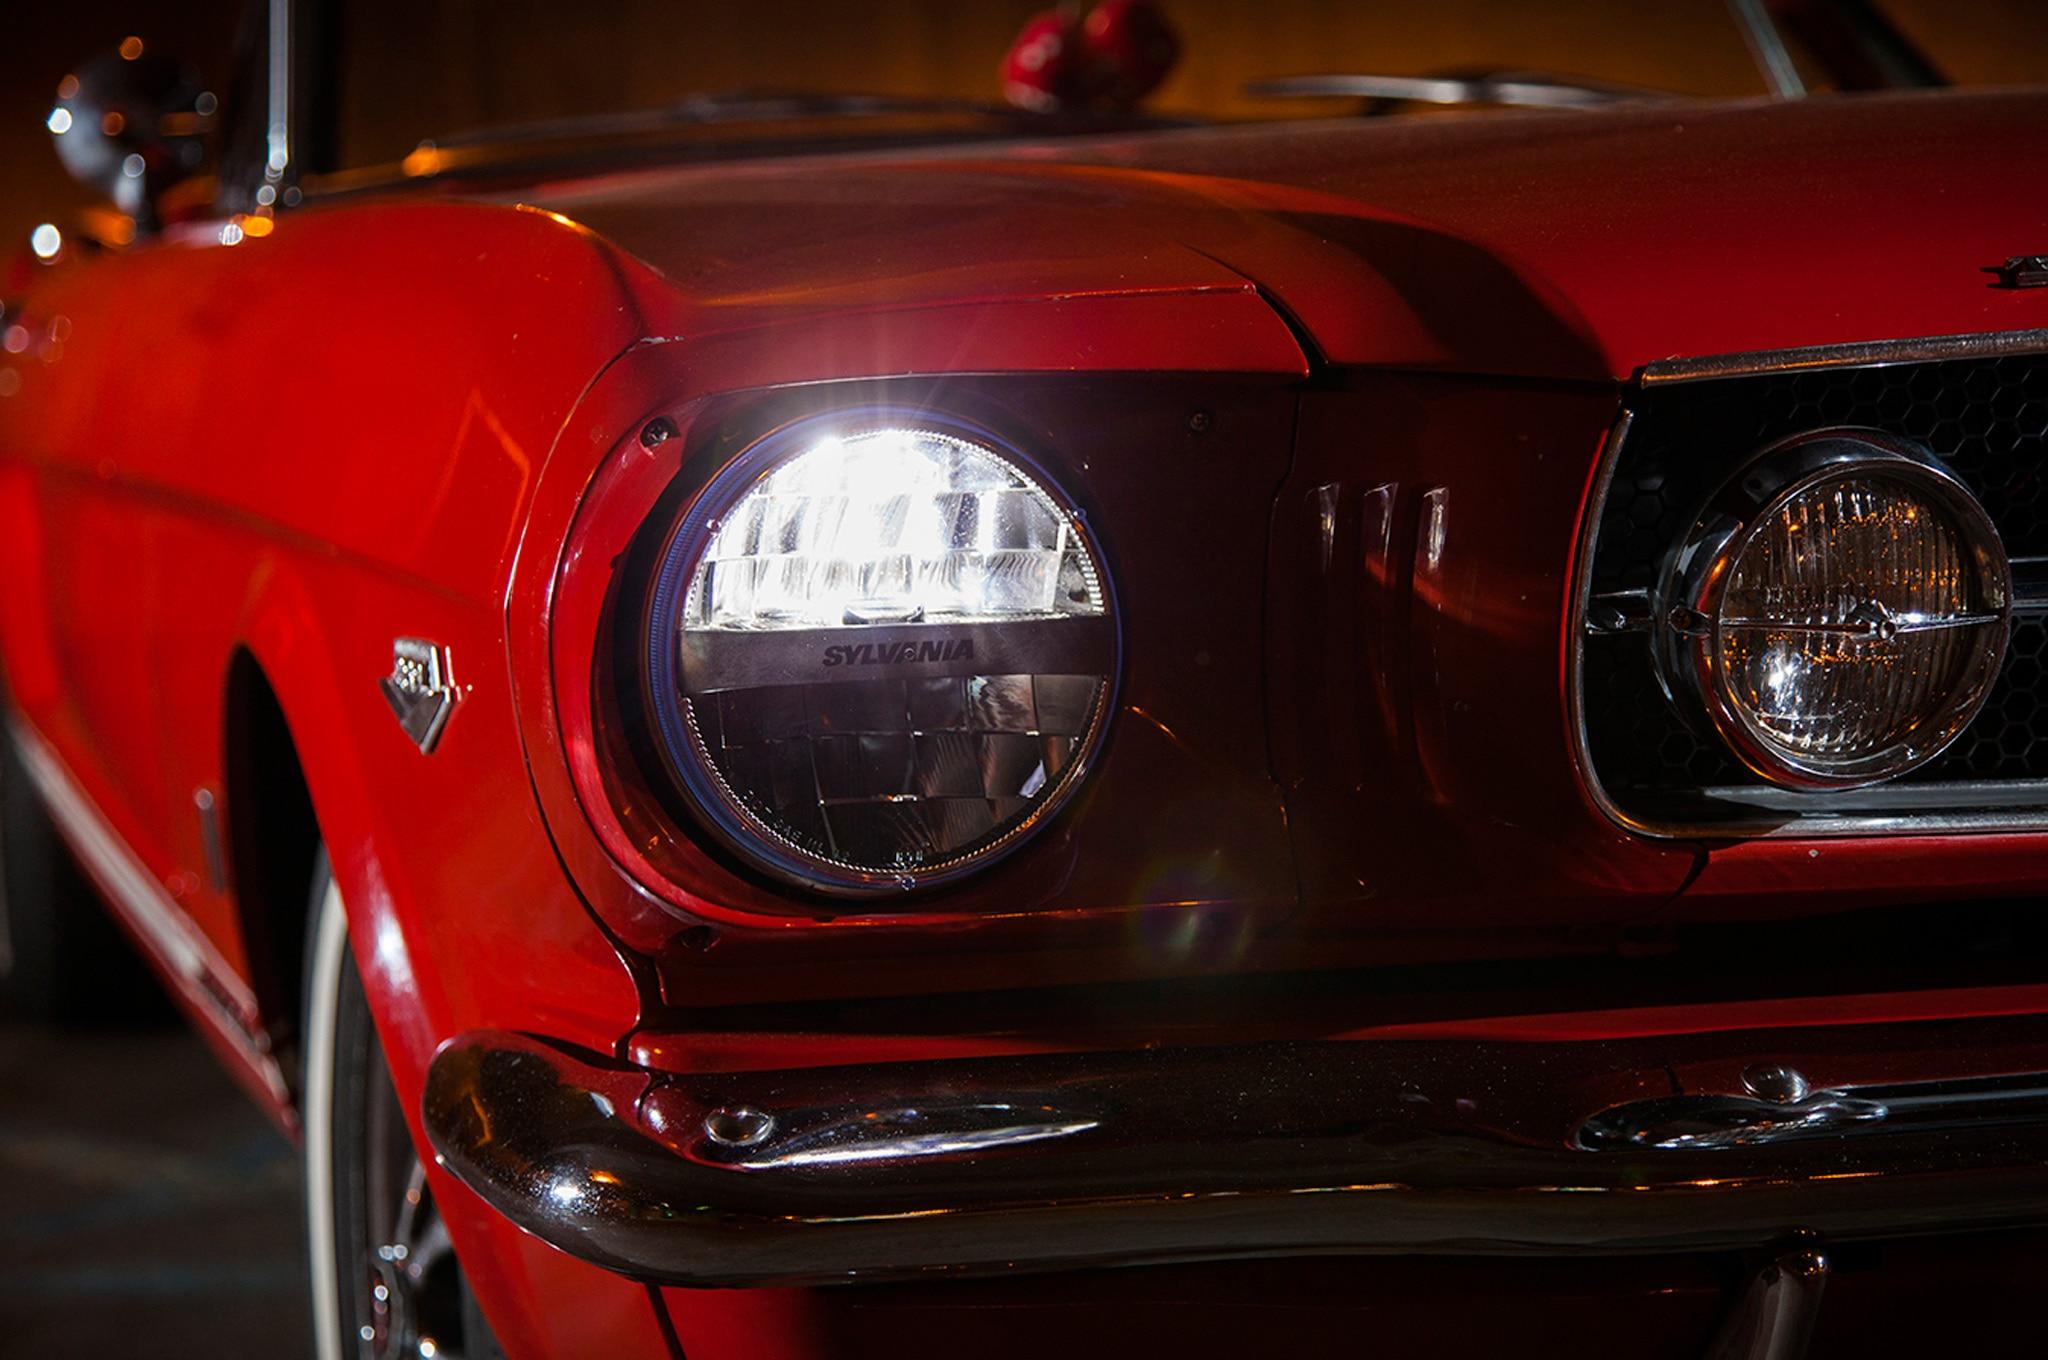 1965 Ford Mustang Sylvania Zevo LED Sealed Beam Headlights